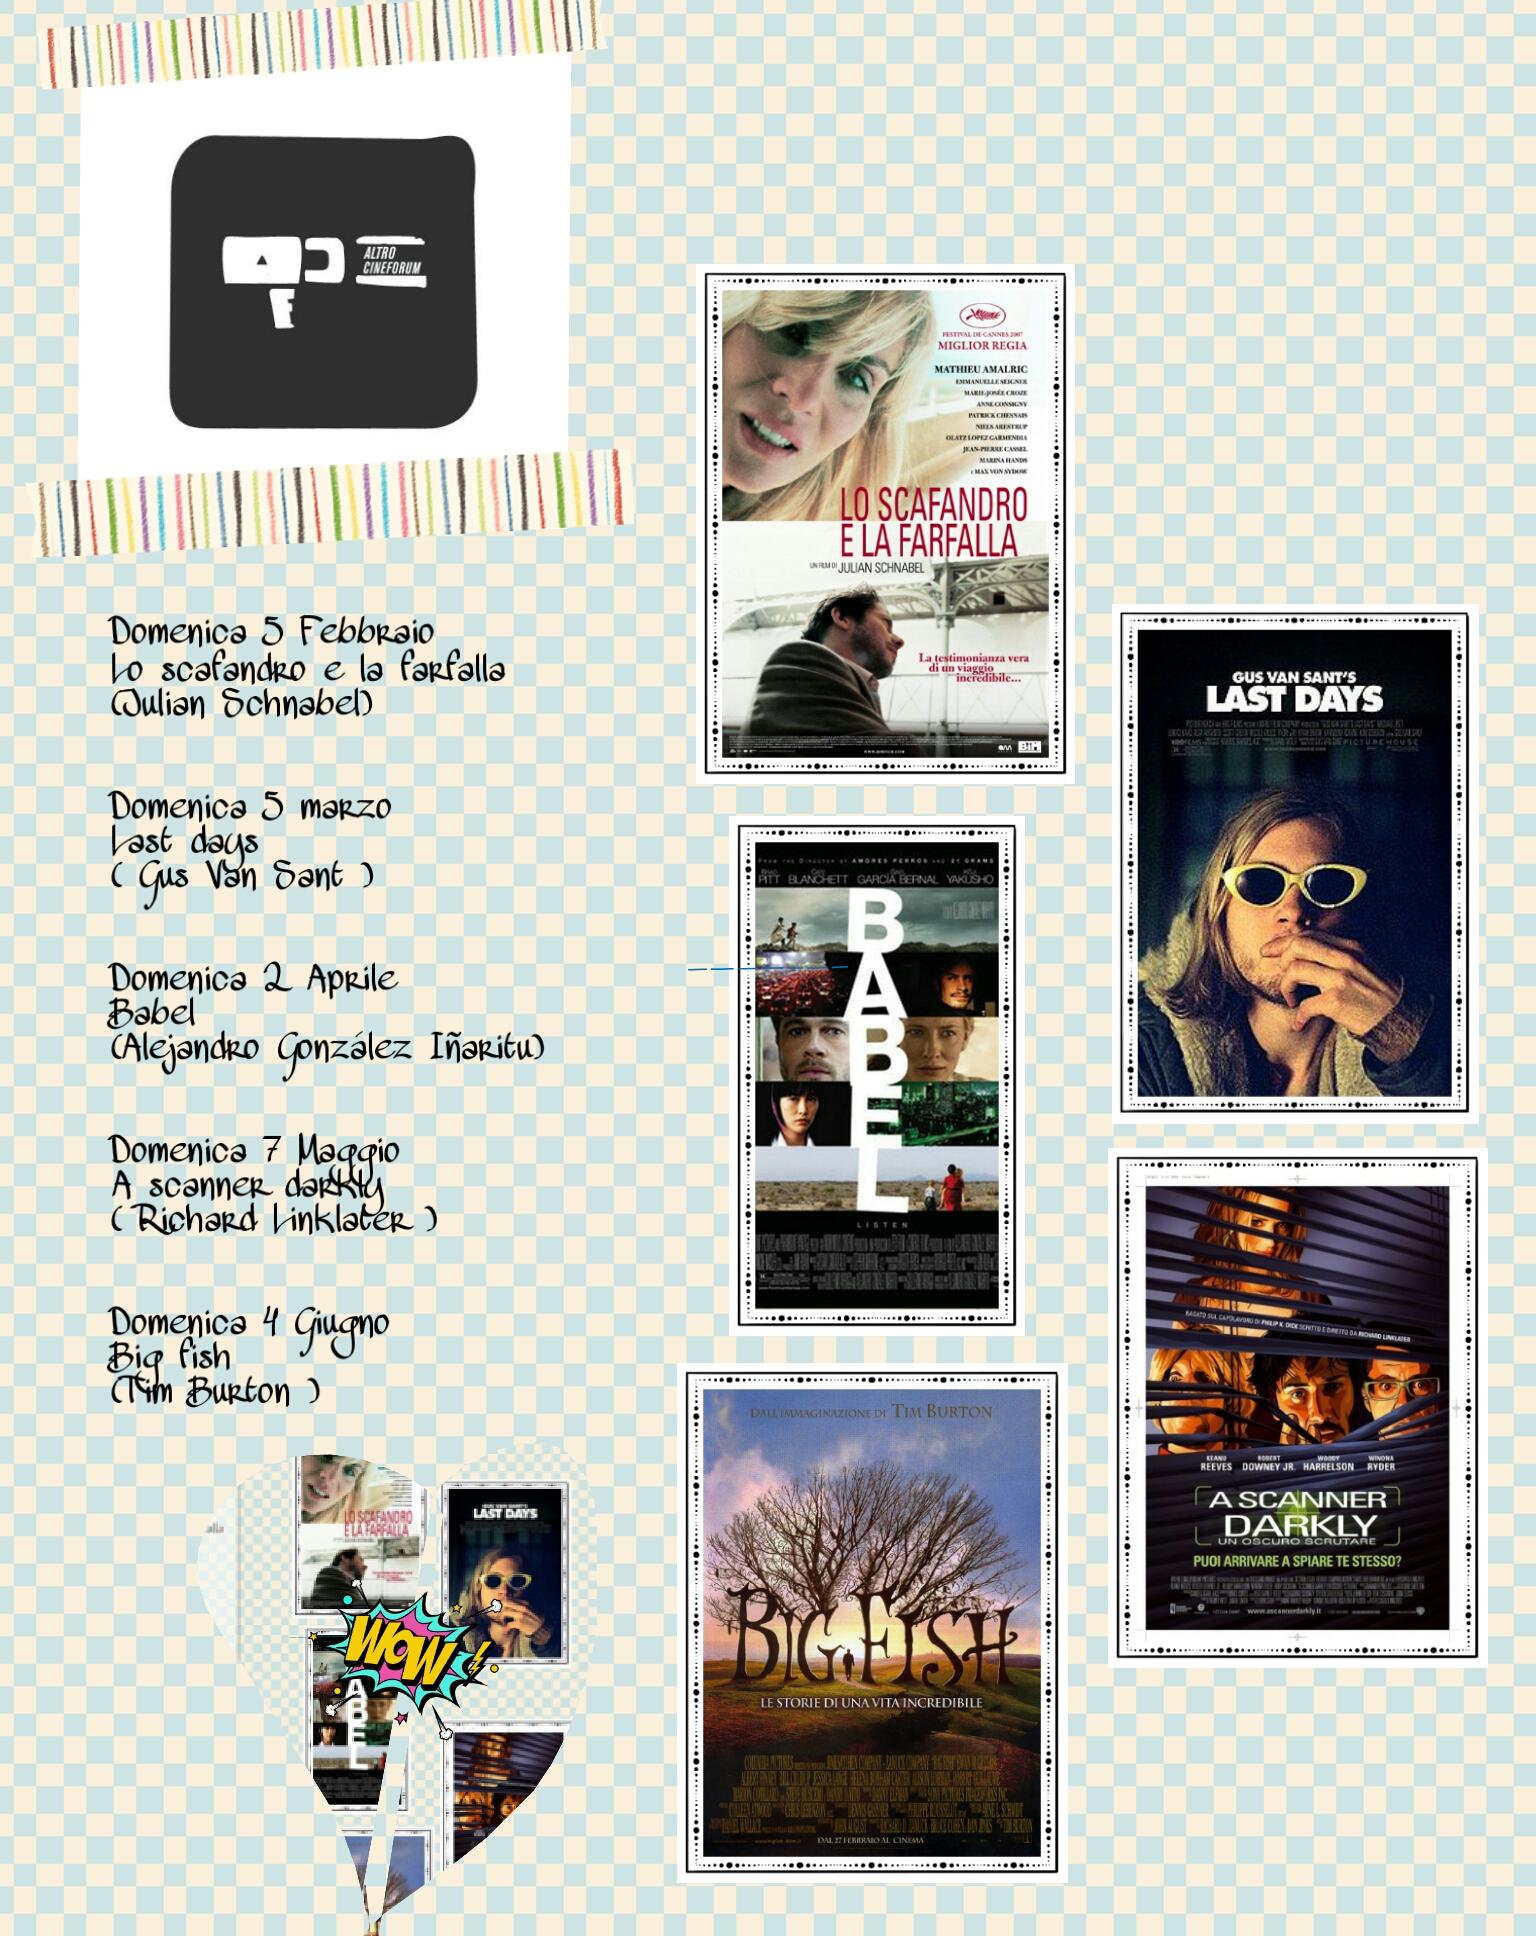 Eterotopia Altro Cineforum, San Giuliano Milanese